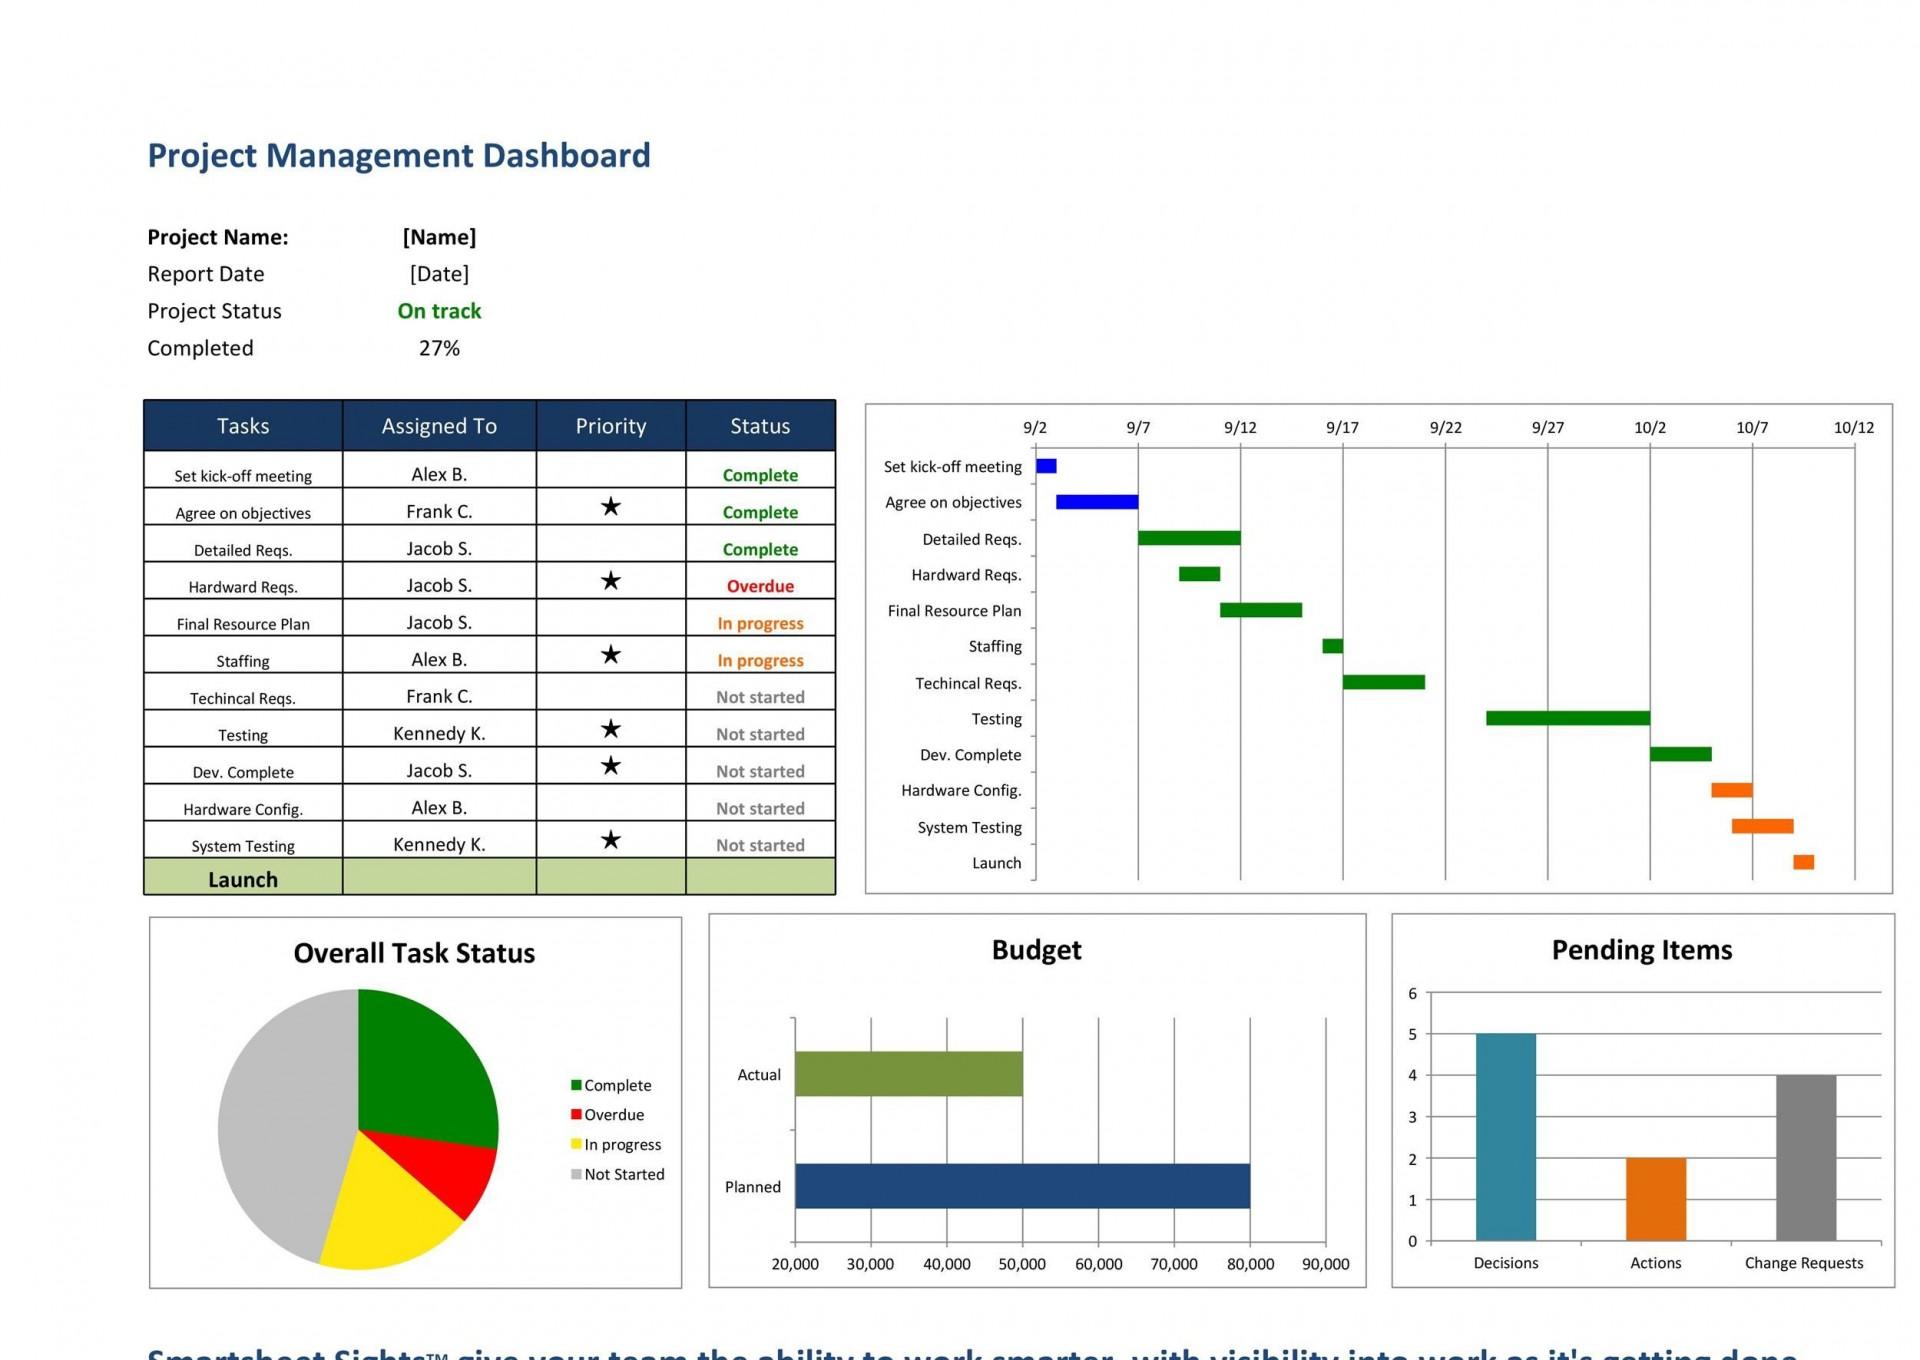 007 Wondrou Project Management Timeline Template Excel Design  Free1920